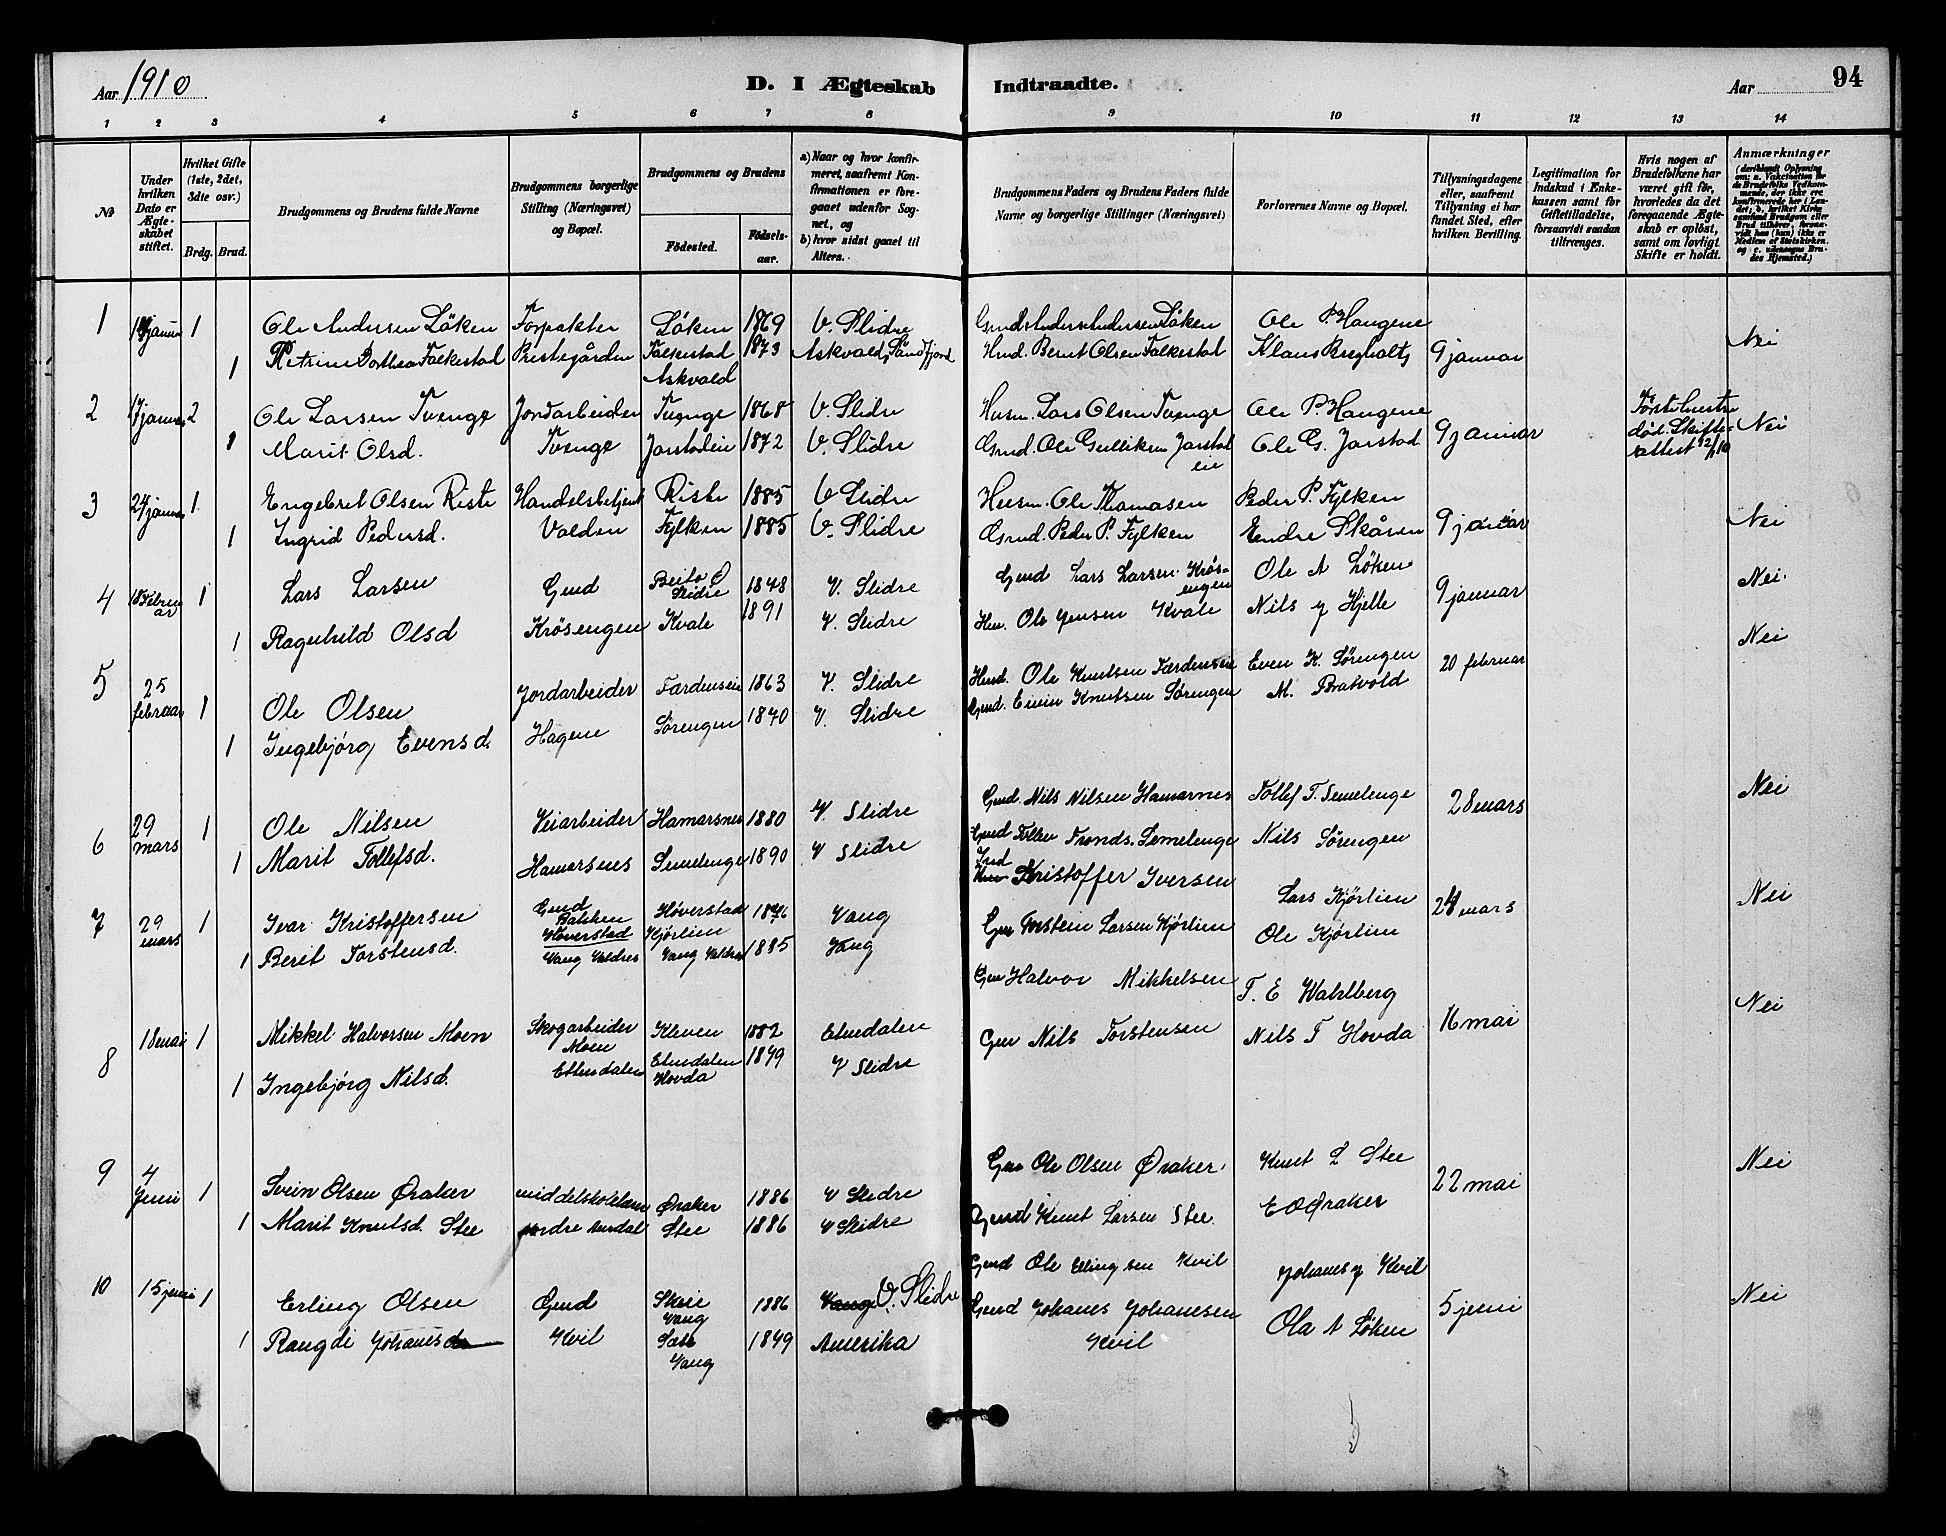 SAH, Vestre Slidre prestekontor, Klokkerbok nr. 4, 1881-1912, s. 94